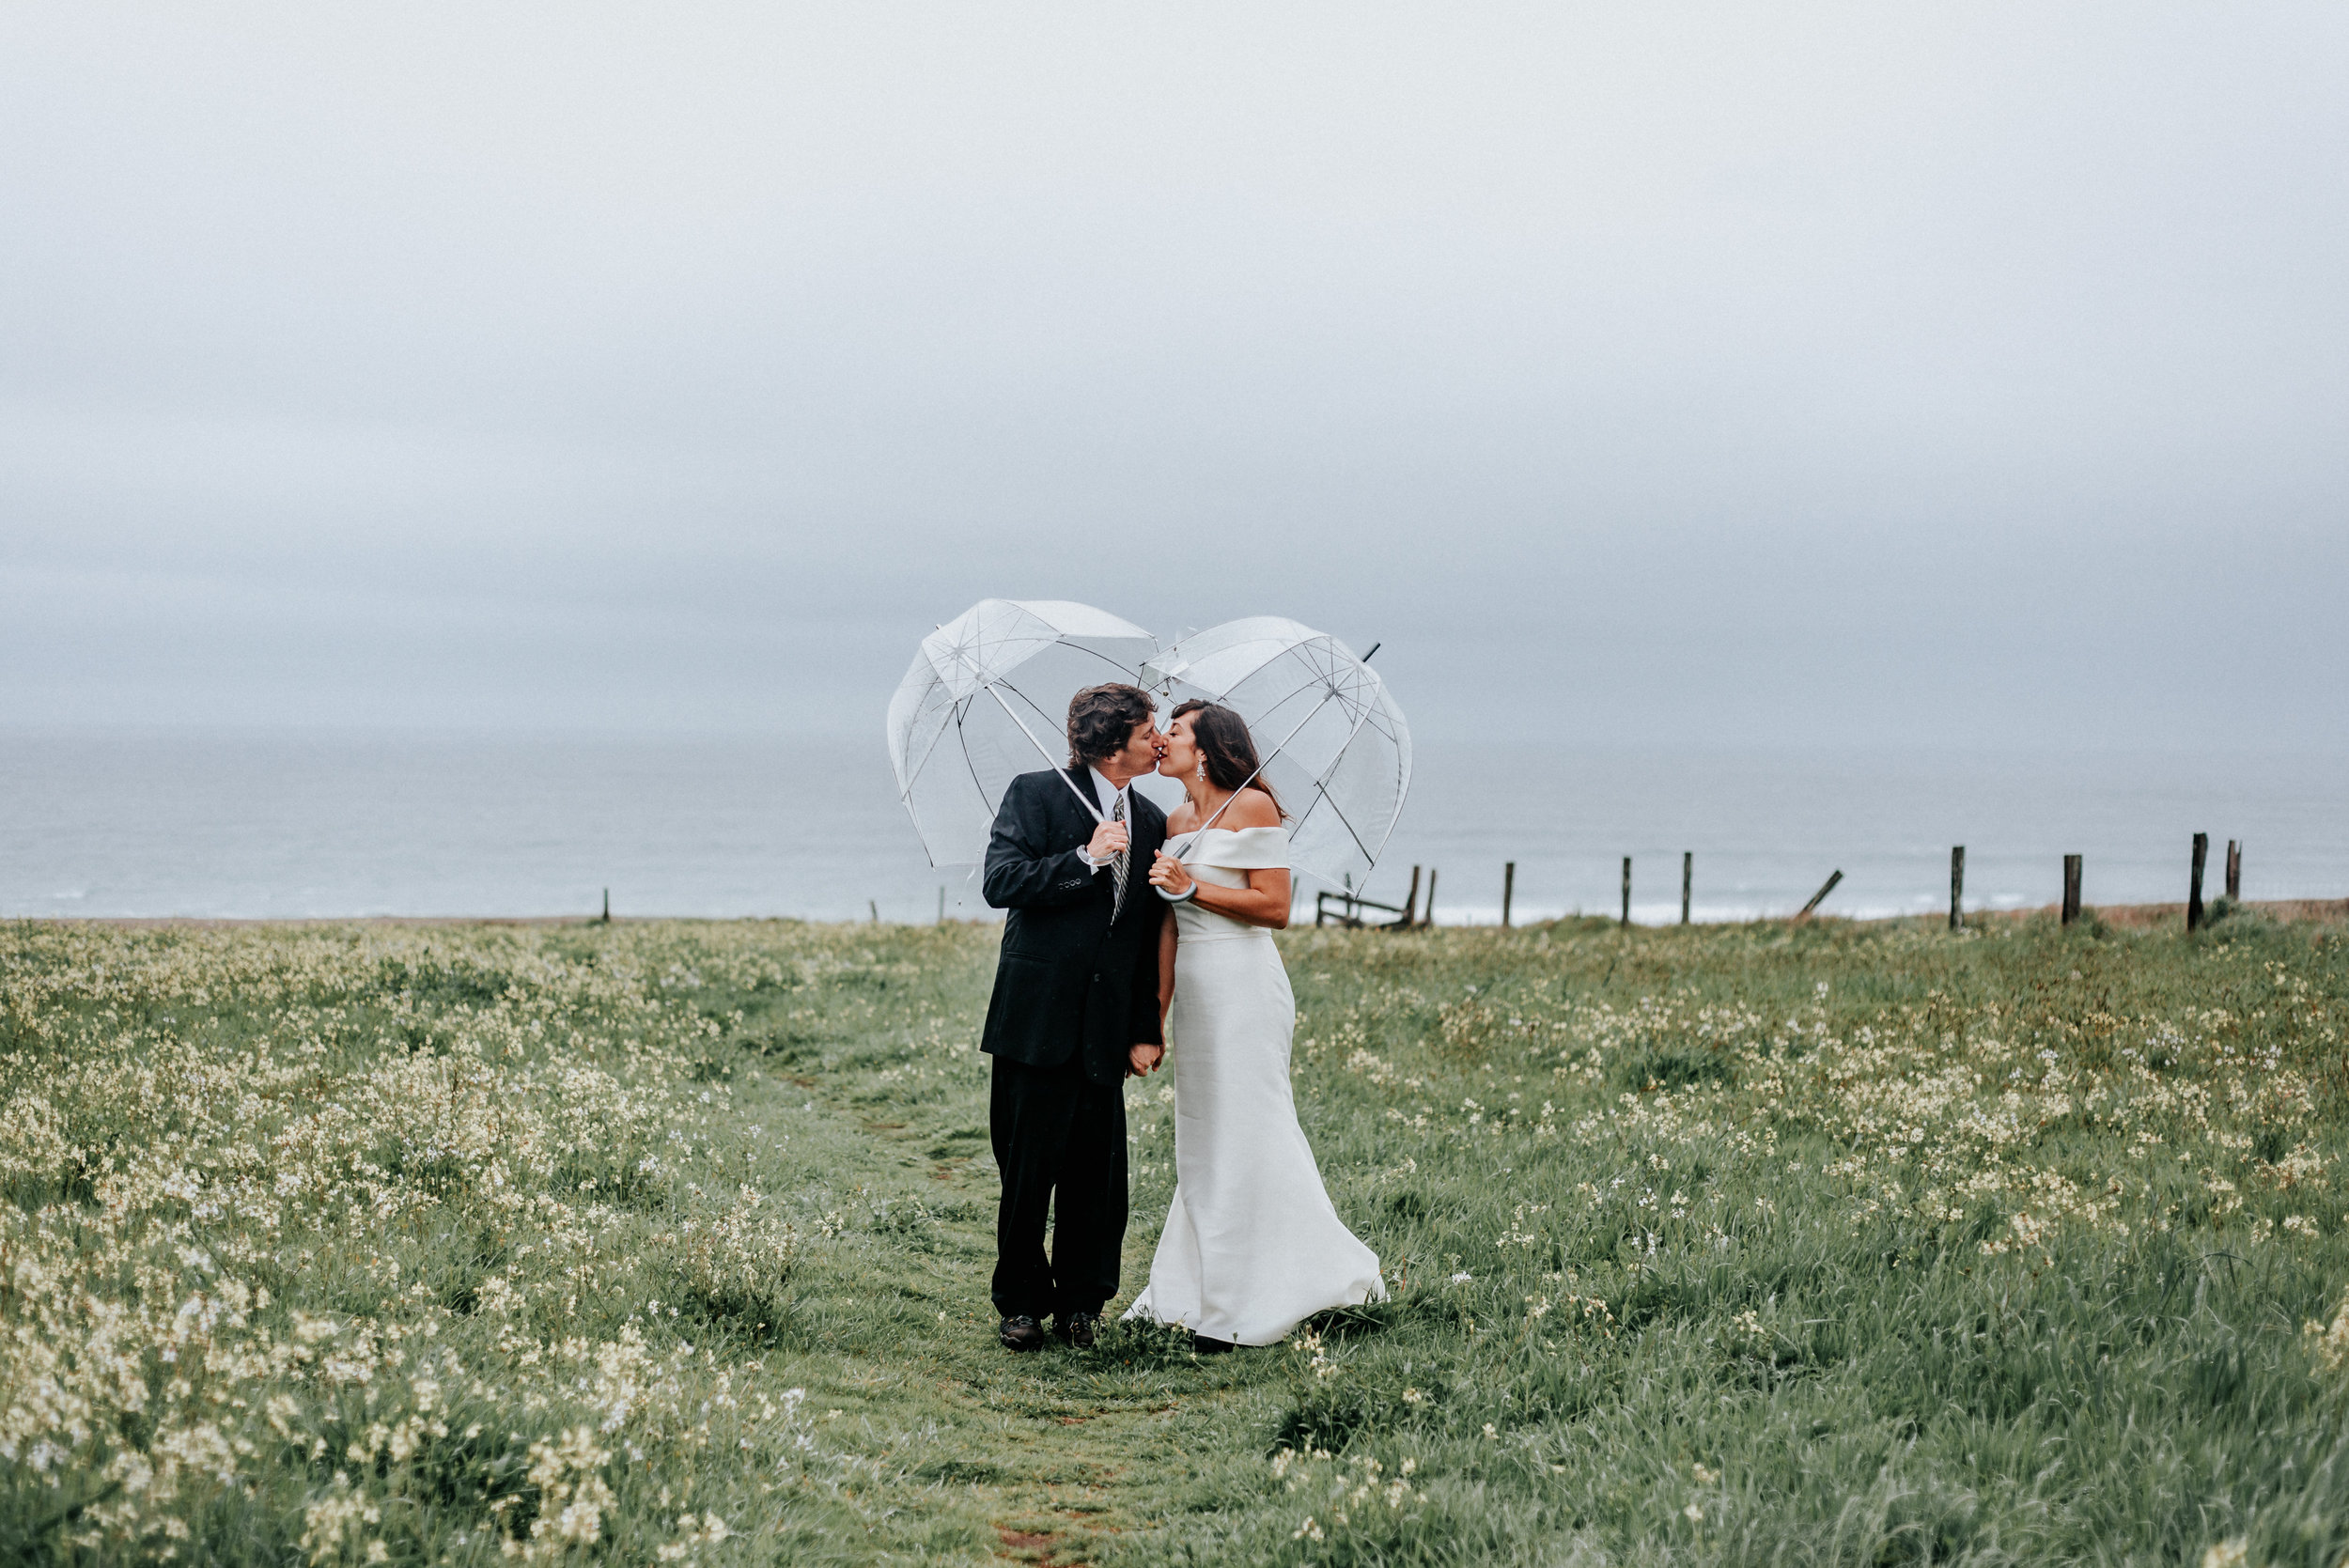 Albion River Inn Wedding in Albion Caliornia-20.jpg